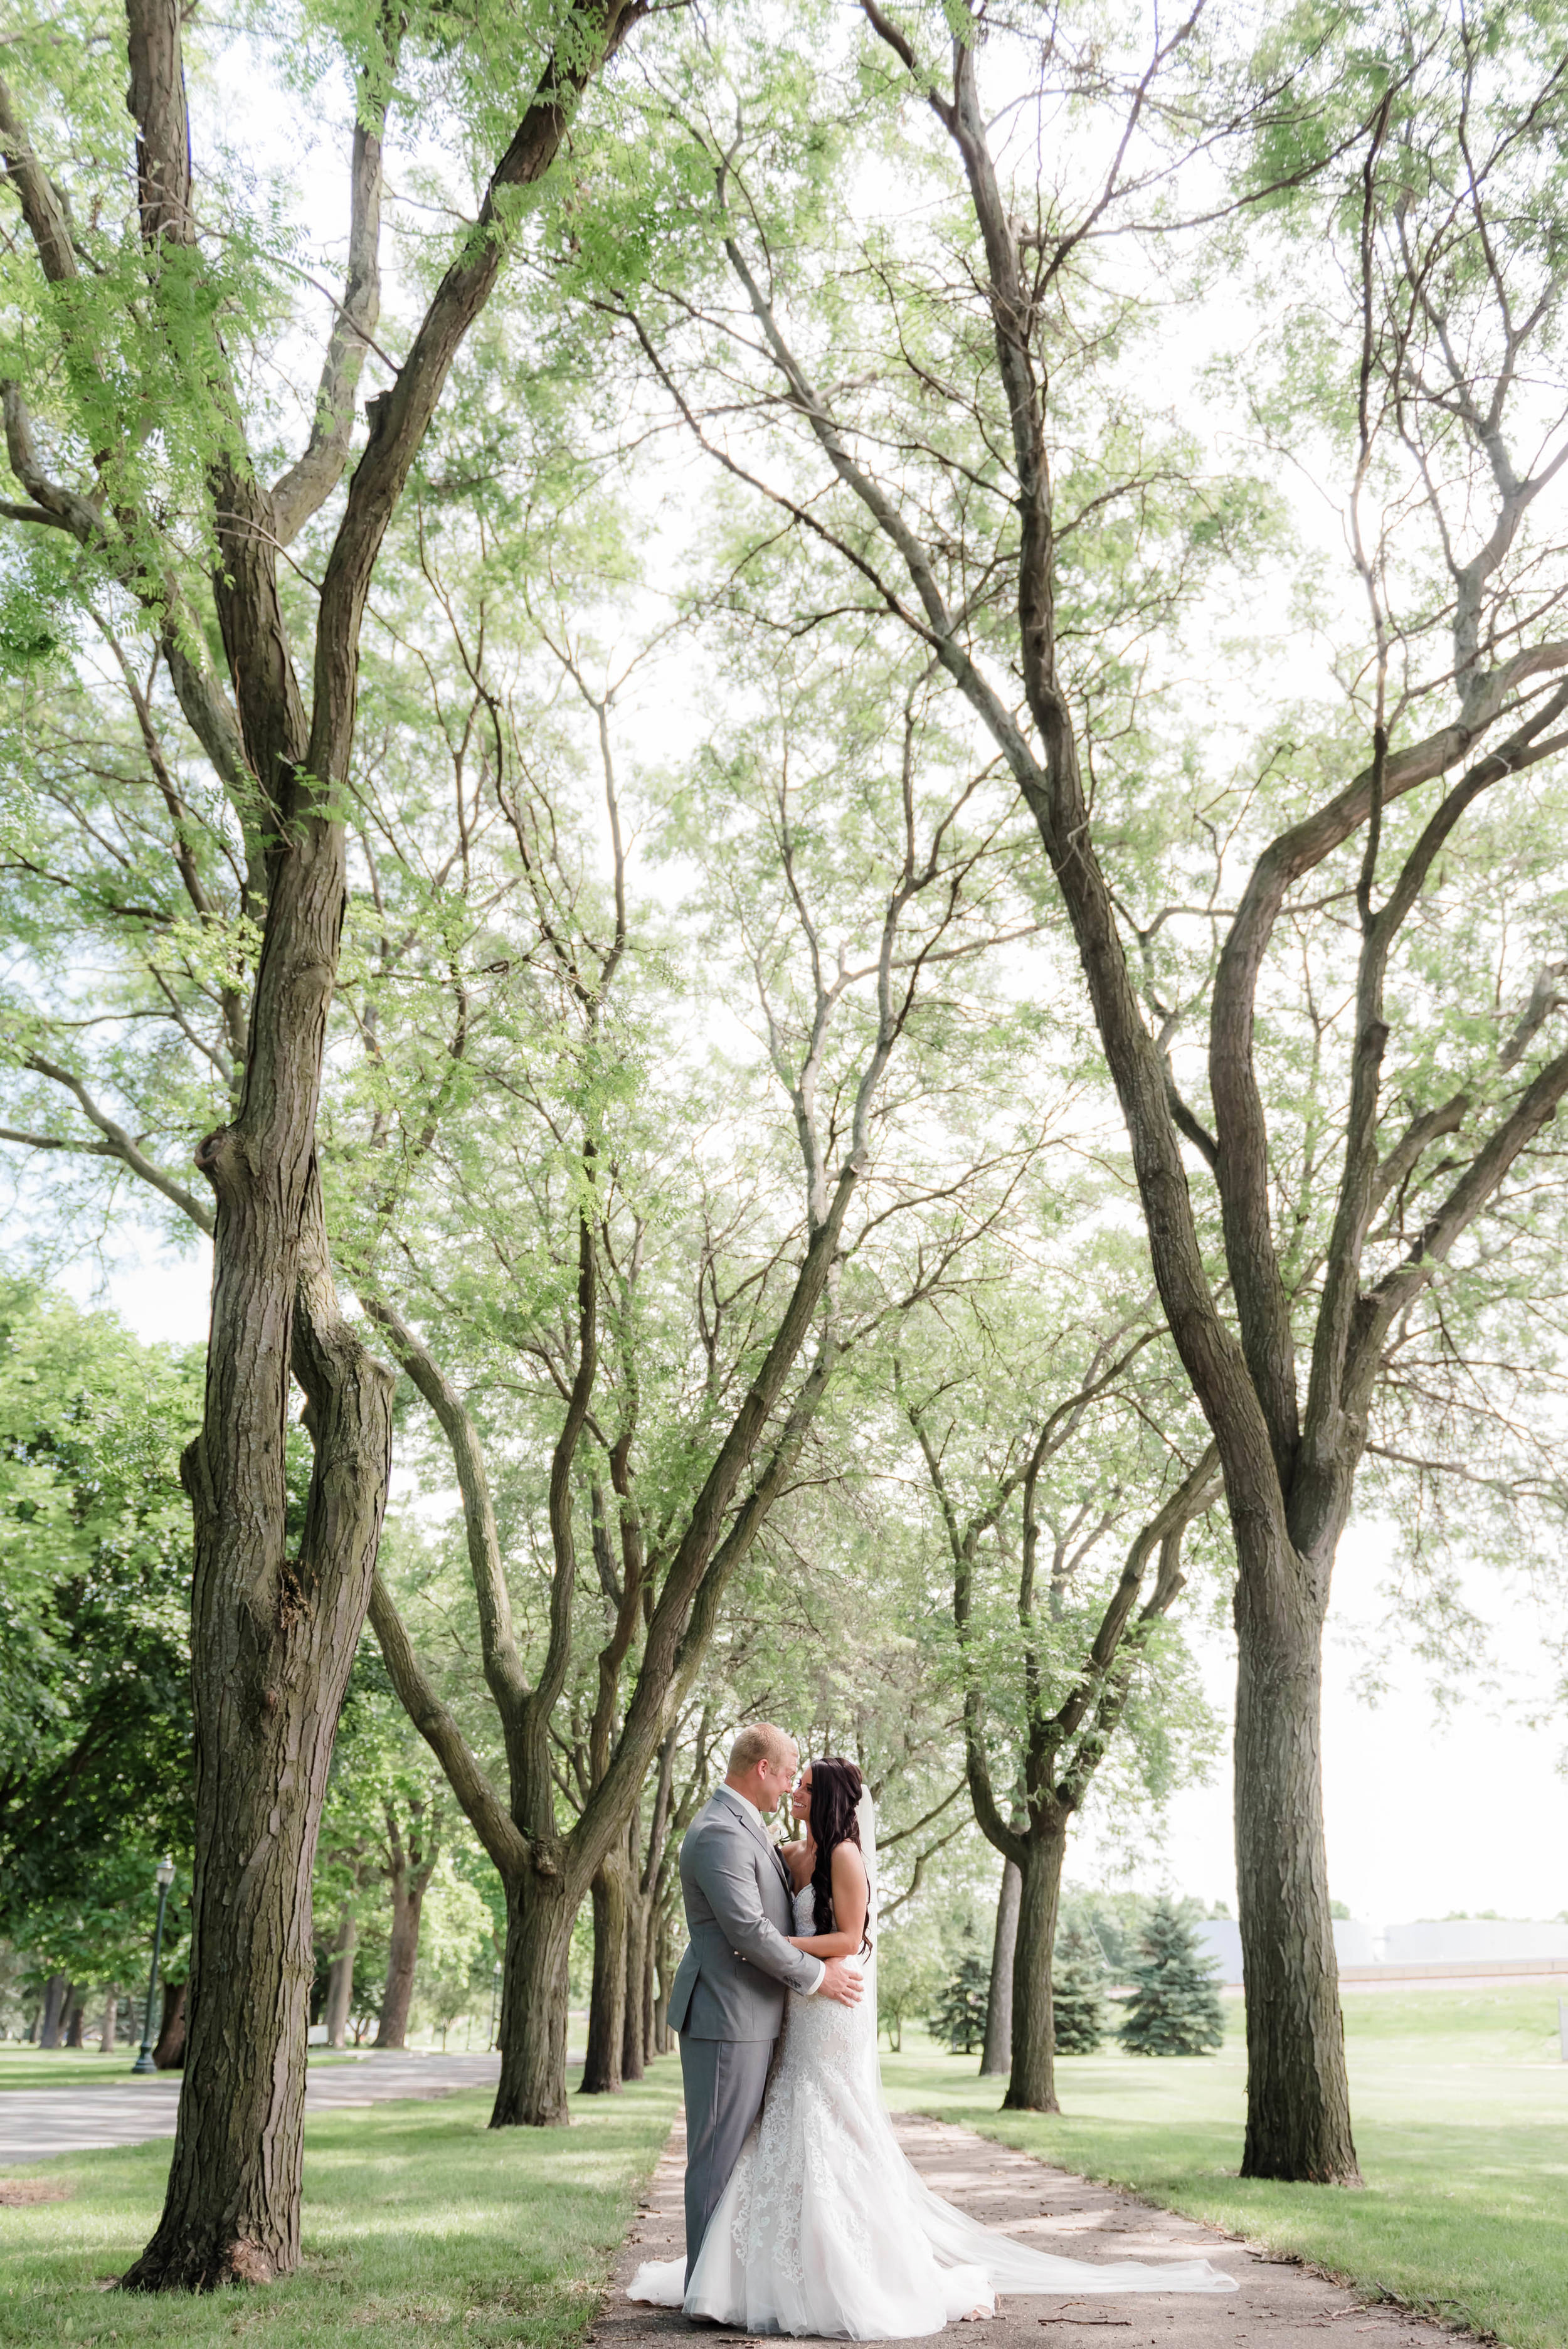 Layce and Brandon - Wedding - Outdoor Portraits-23.jpg